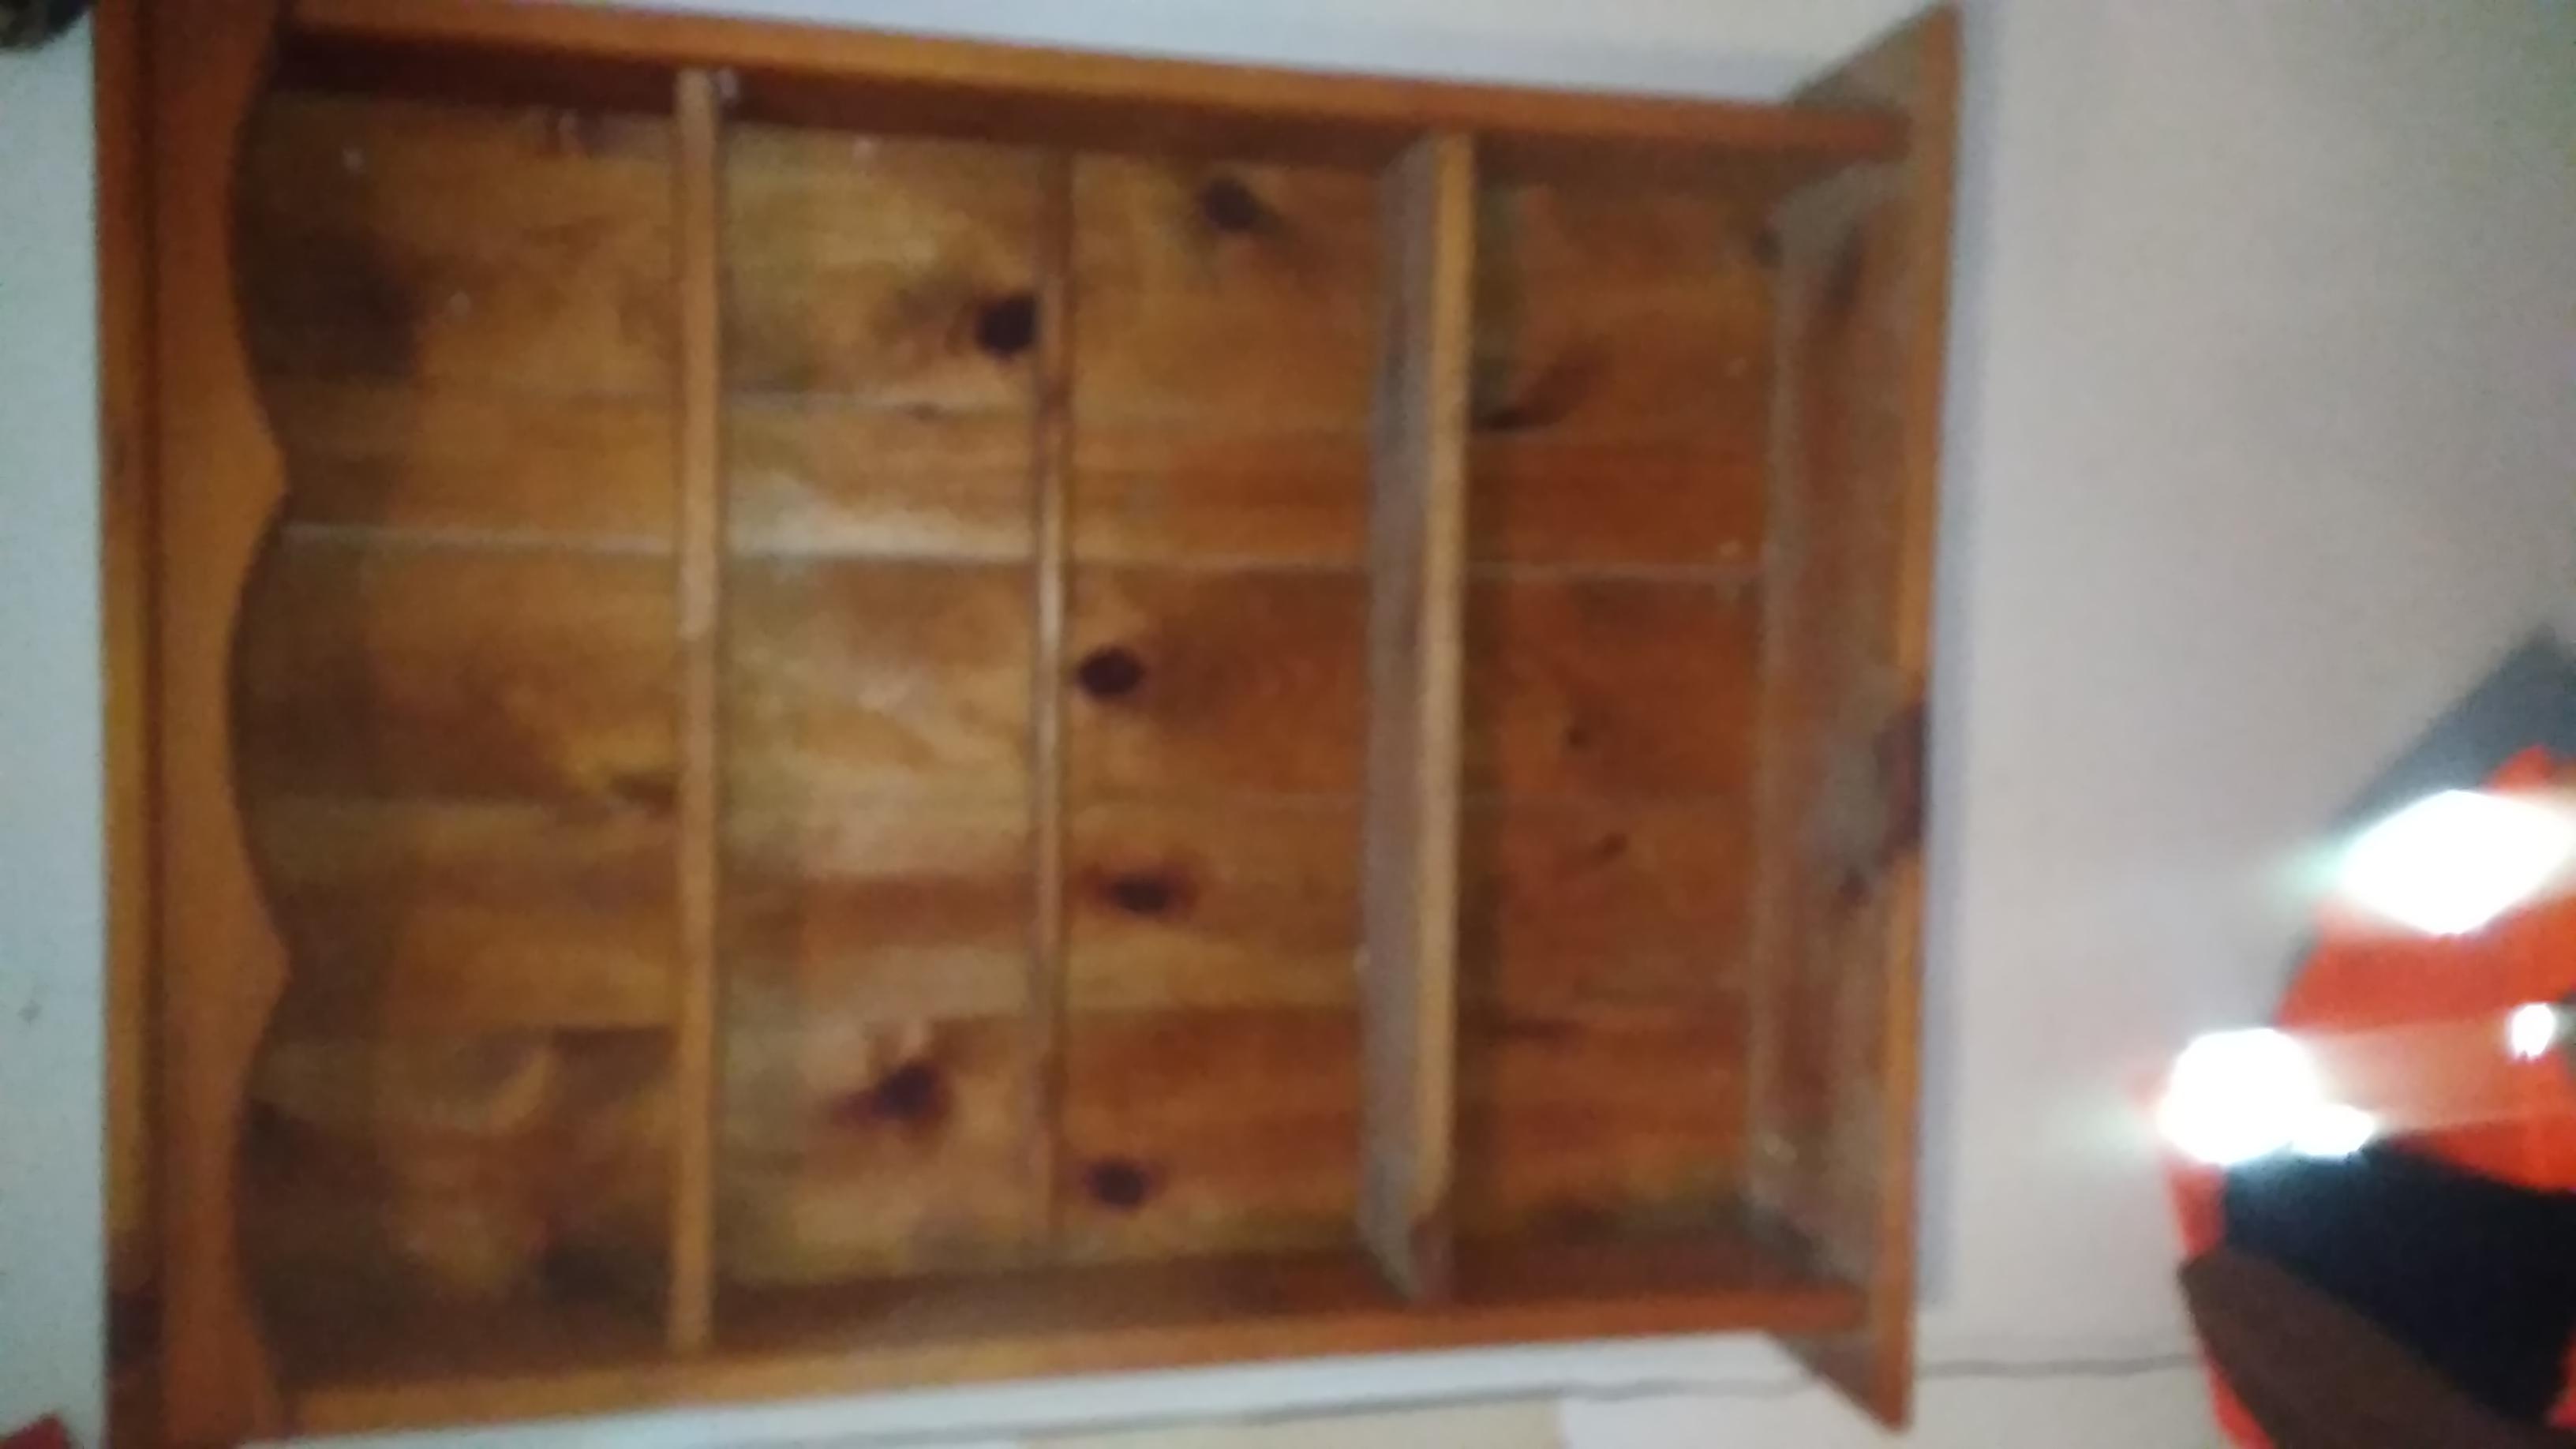 Shelf with light